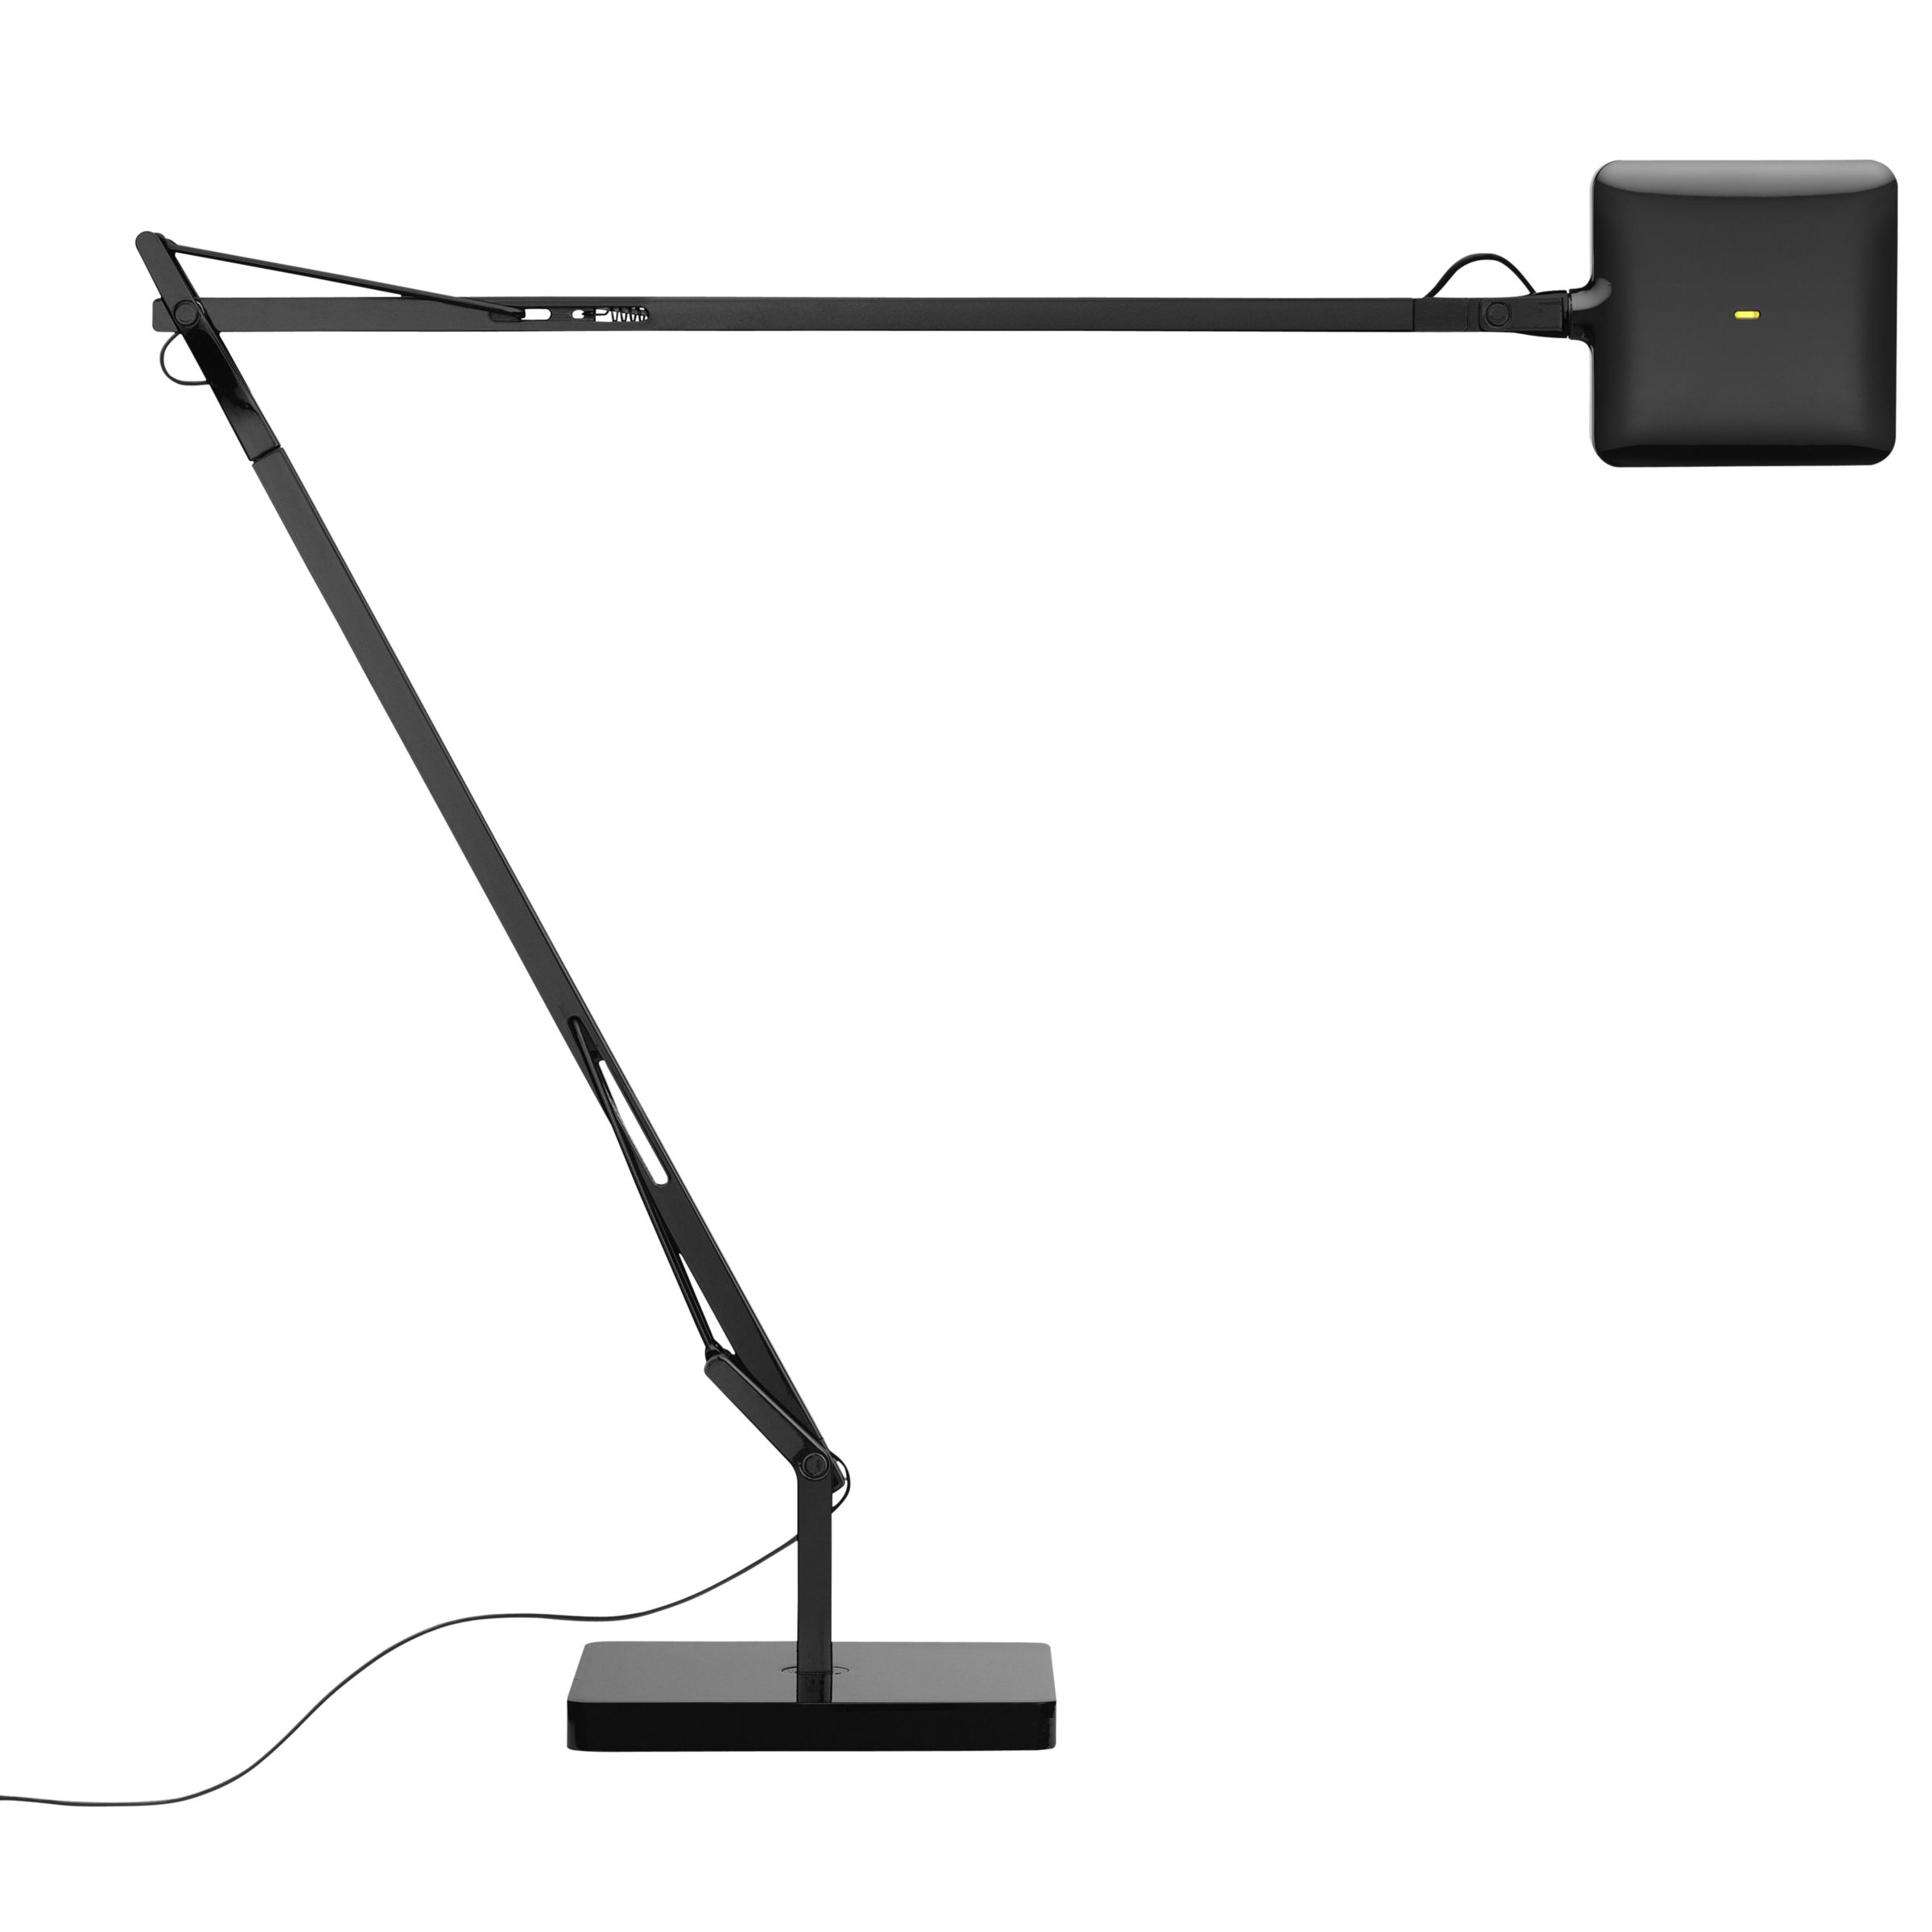 Flos Kelvin LED Task Lamp, Black at JohnLewis